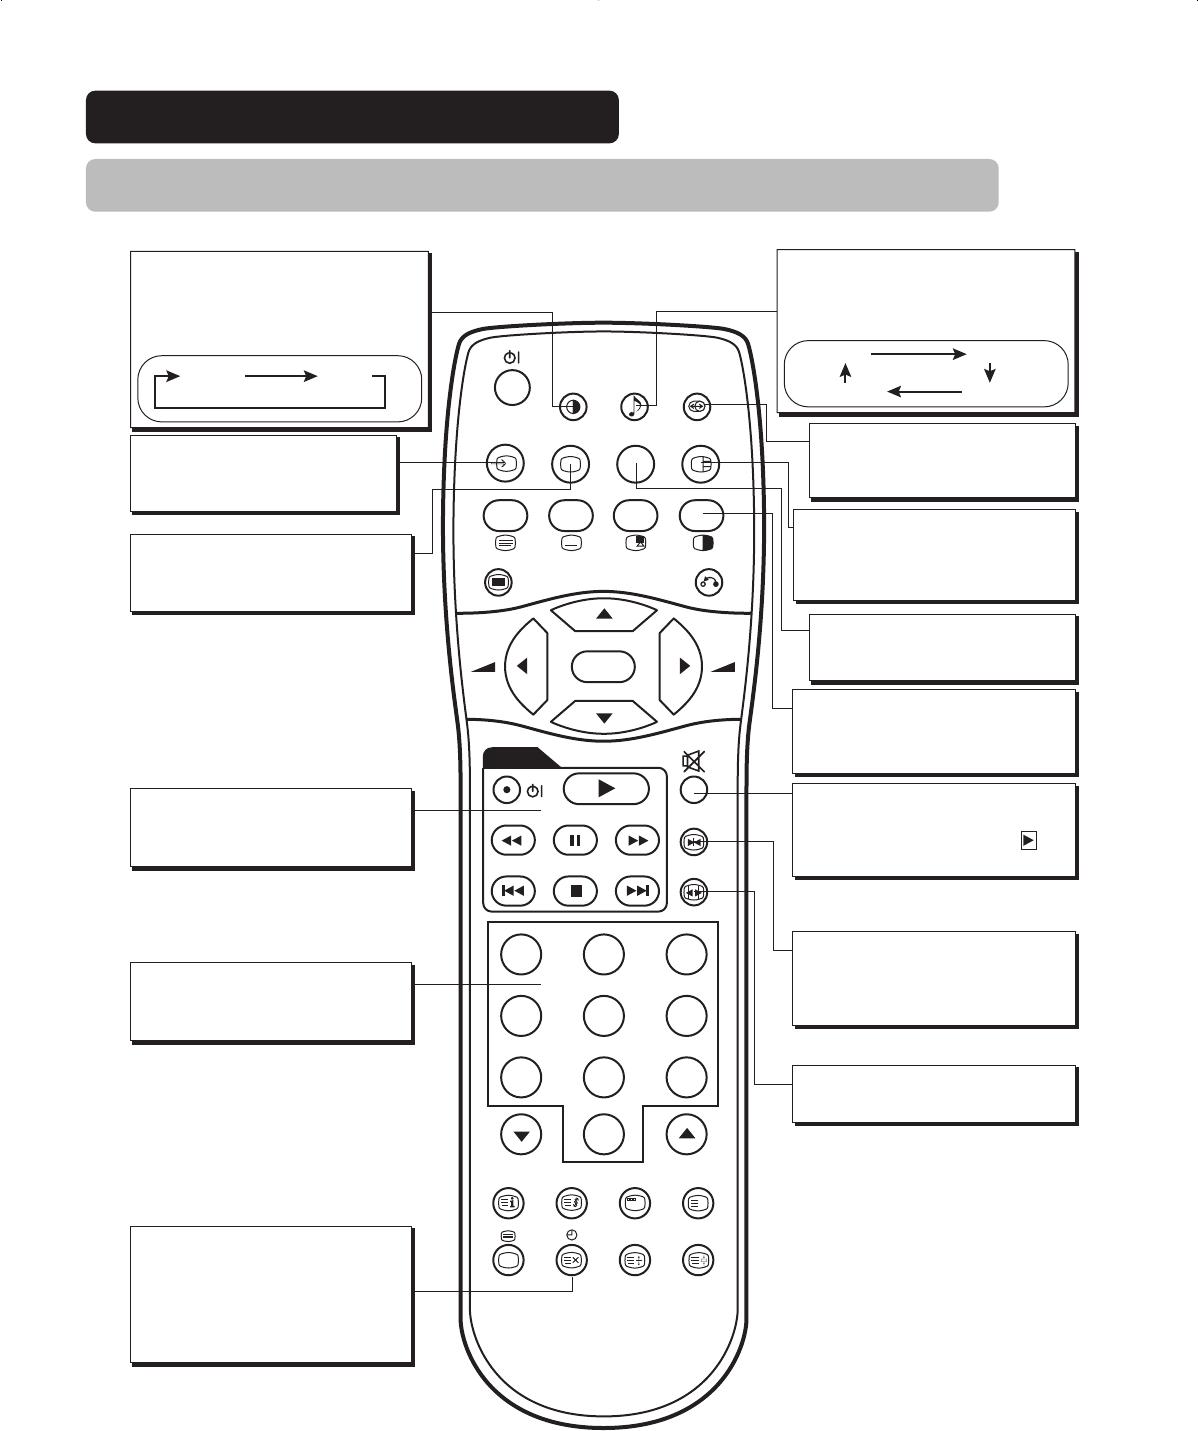 Hitachi 32PD5000, 42PD5000, 42PMA500 COMPONENT NAMES